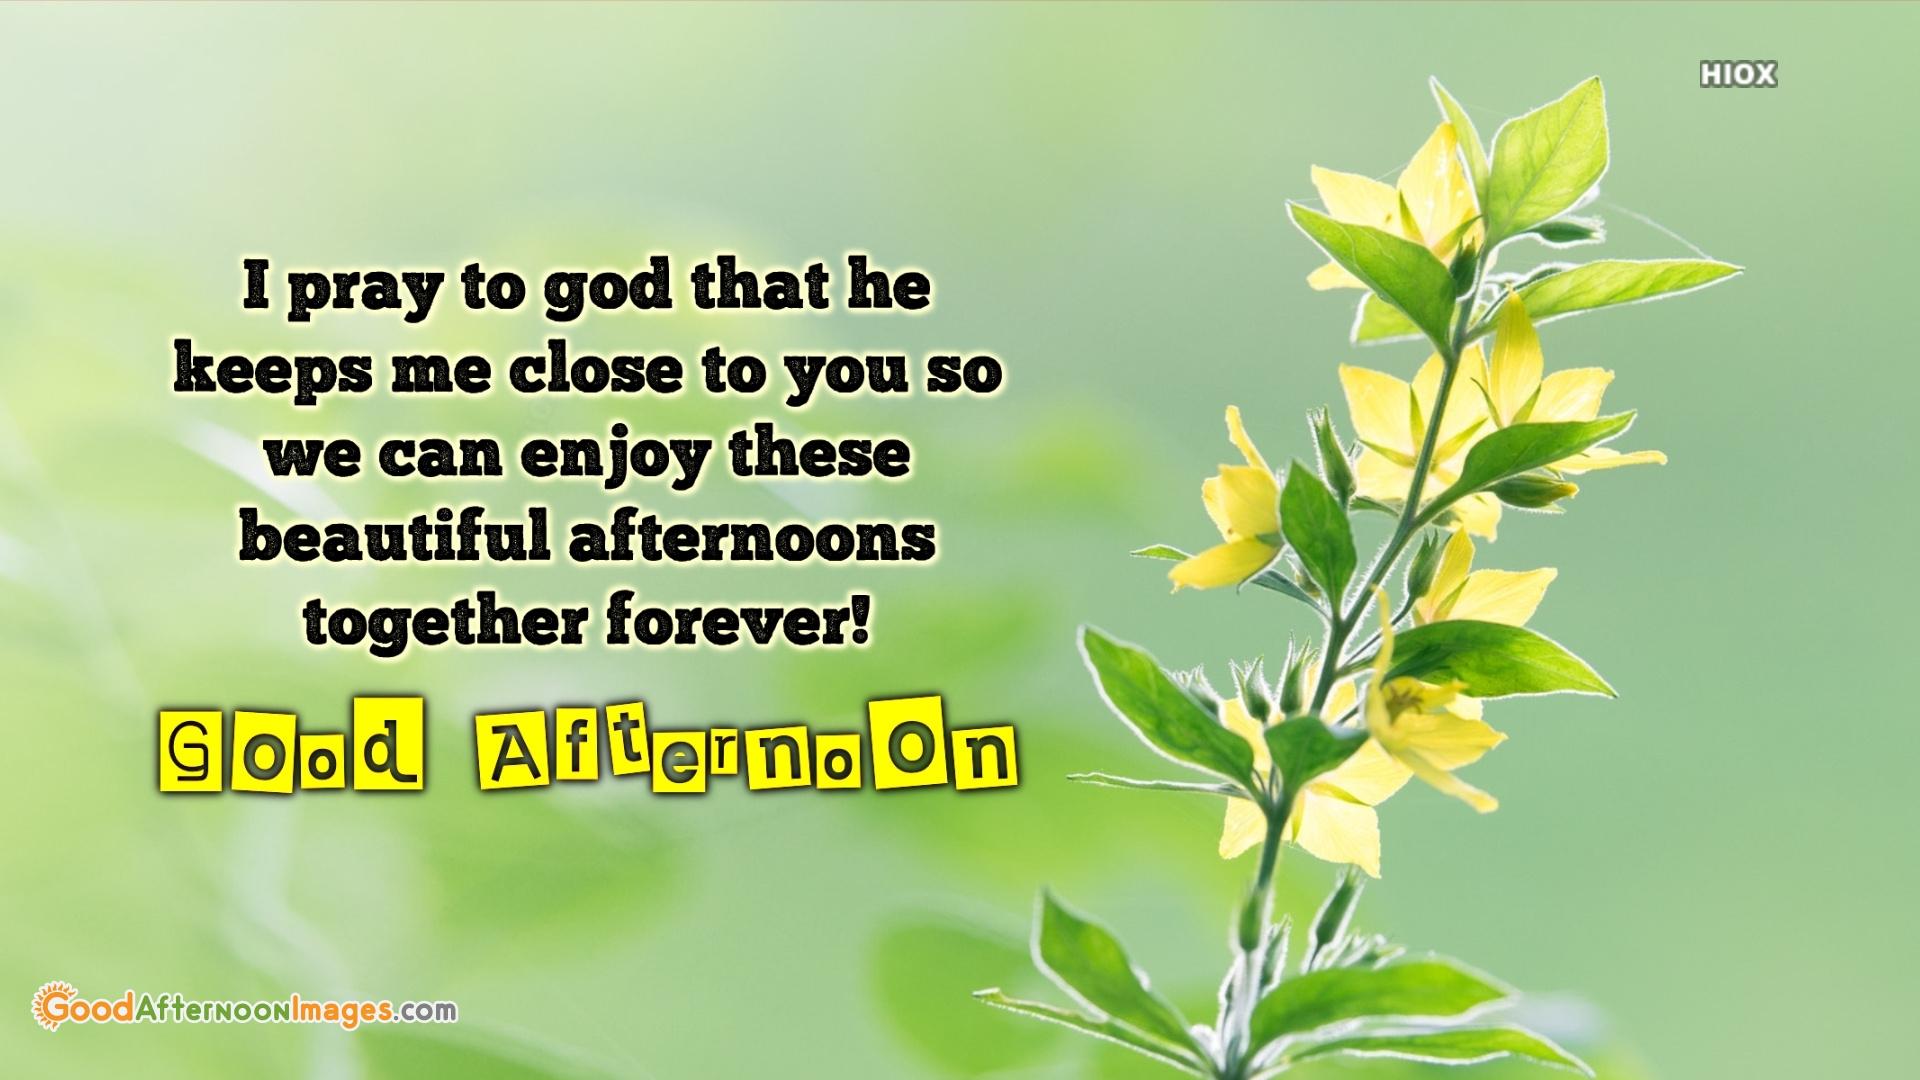 Good Afternoon Prayer Wishes